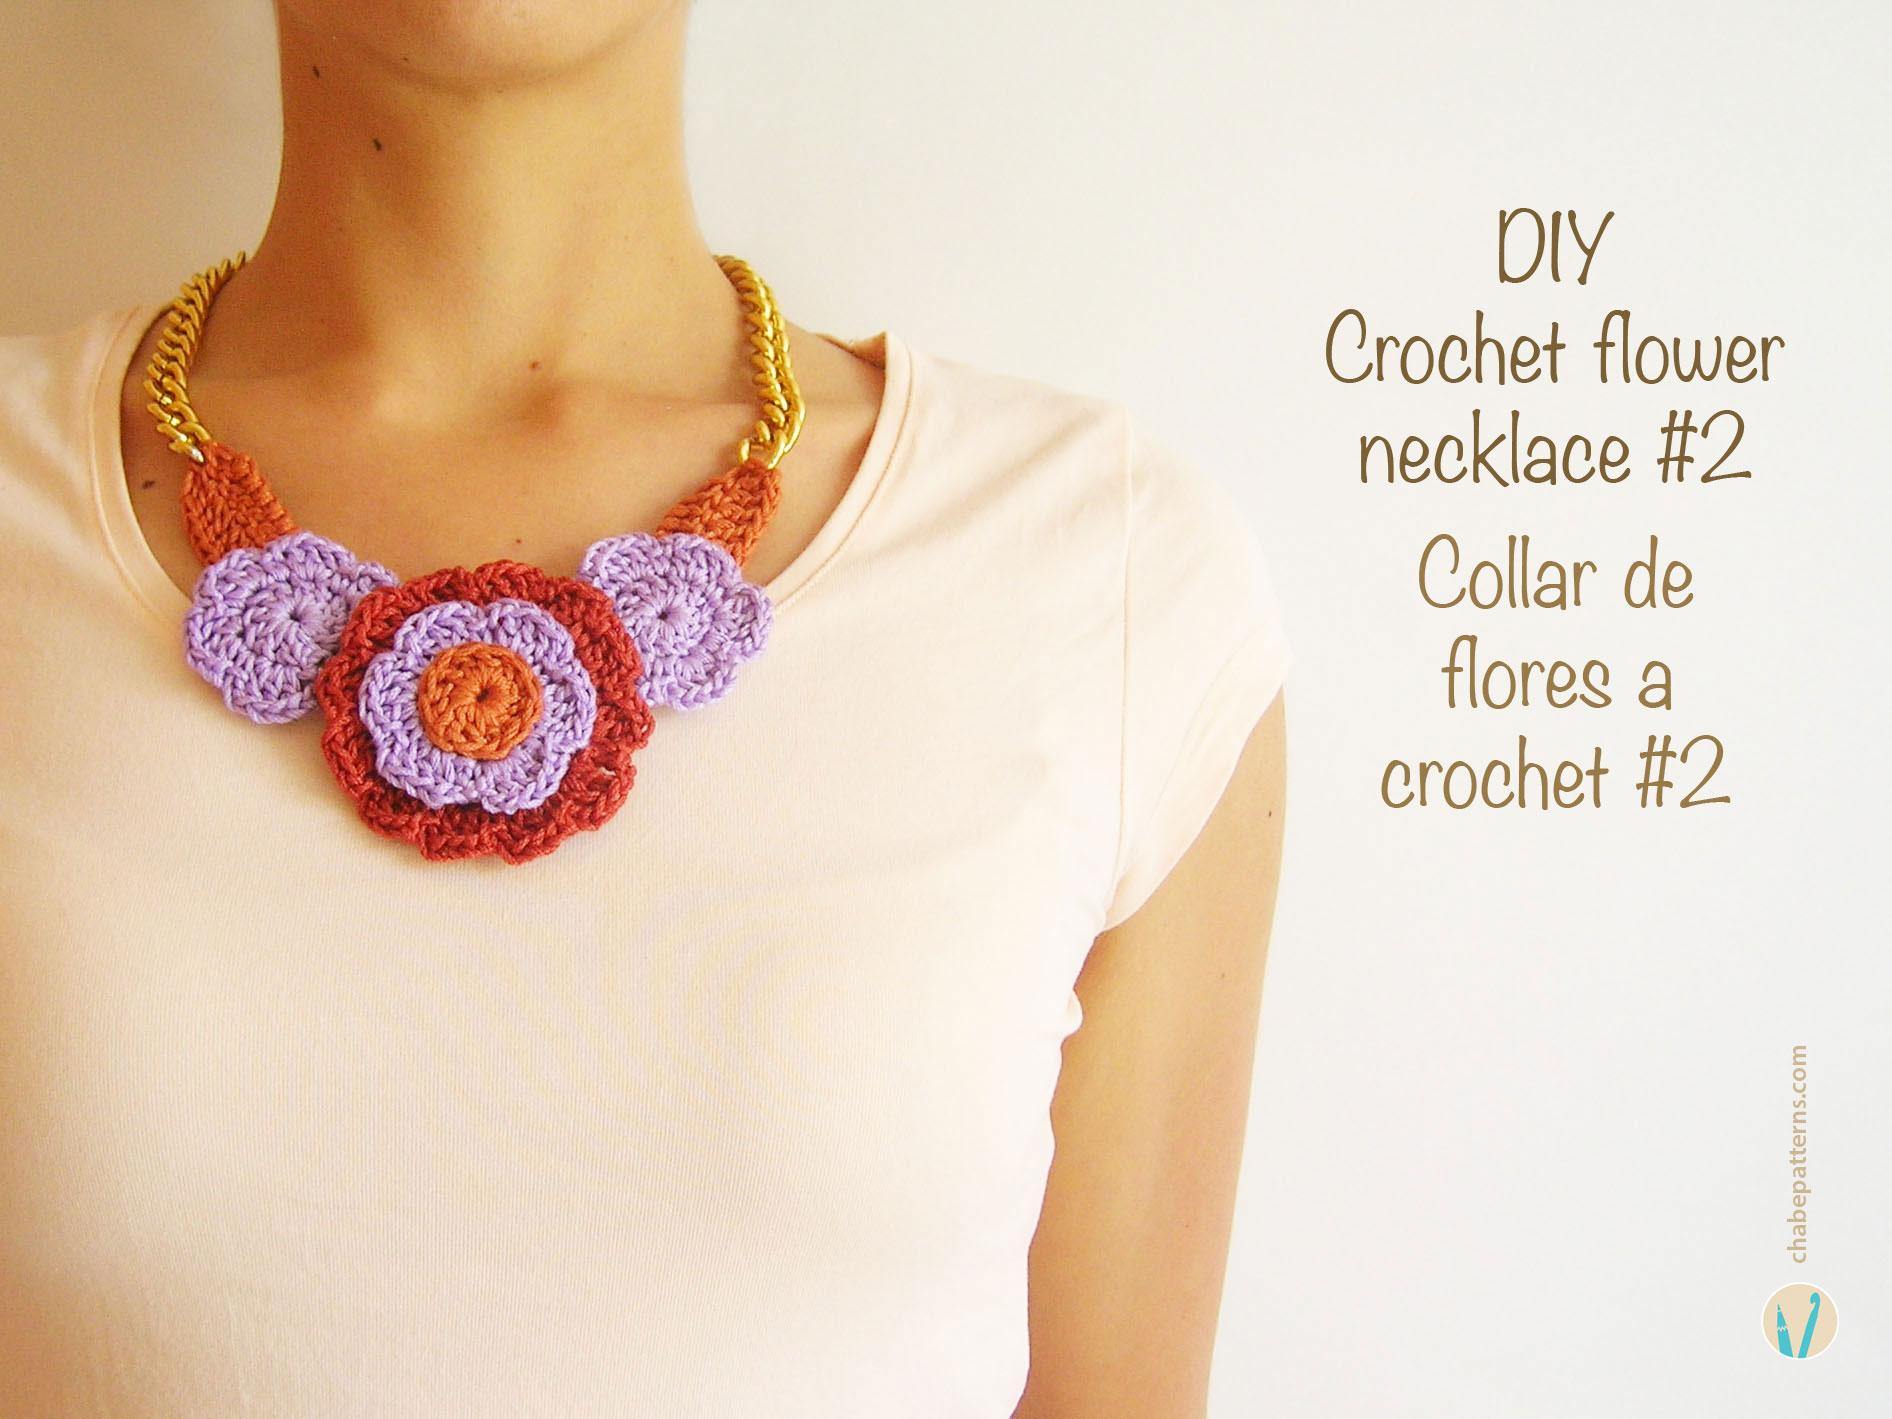 Crochet flower necklace #2/ Collar de flores a crochet #2